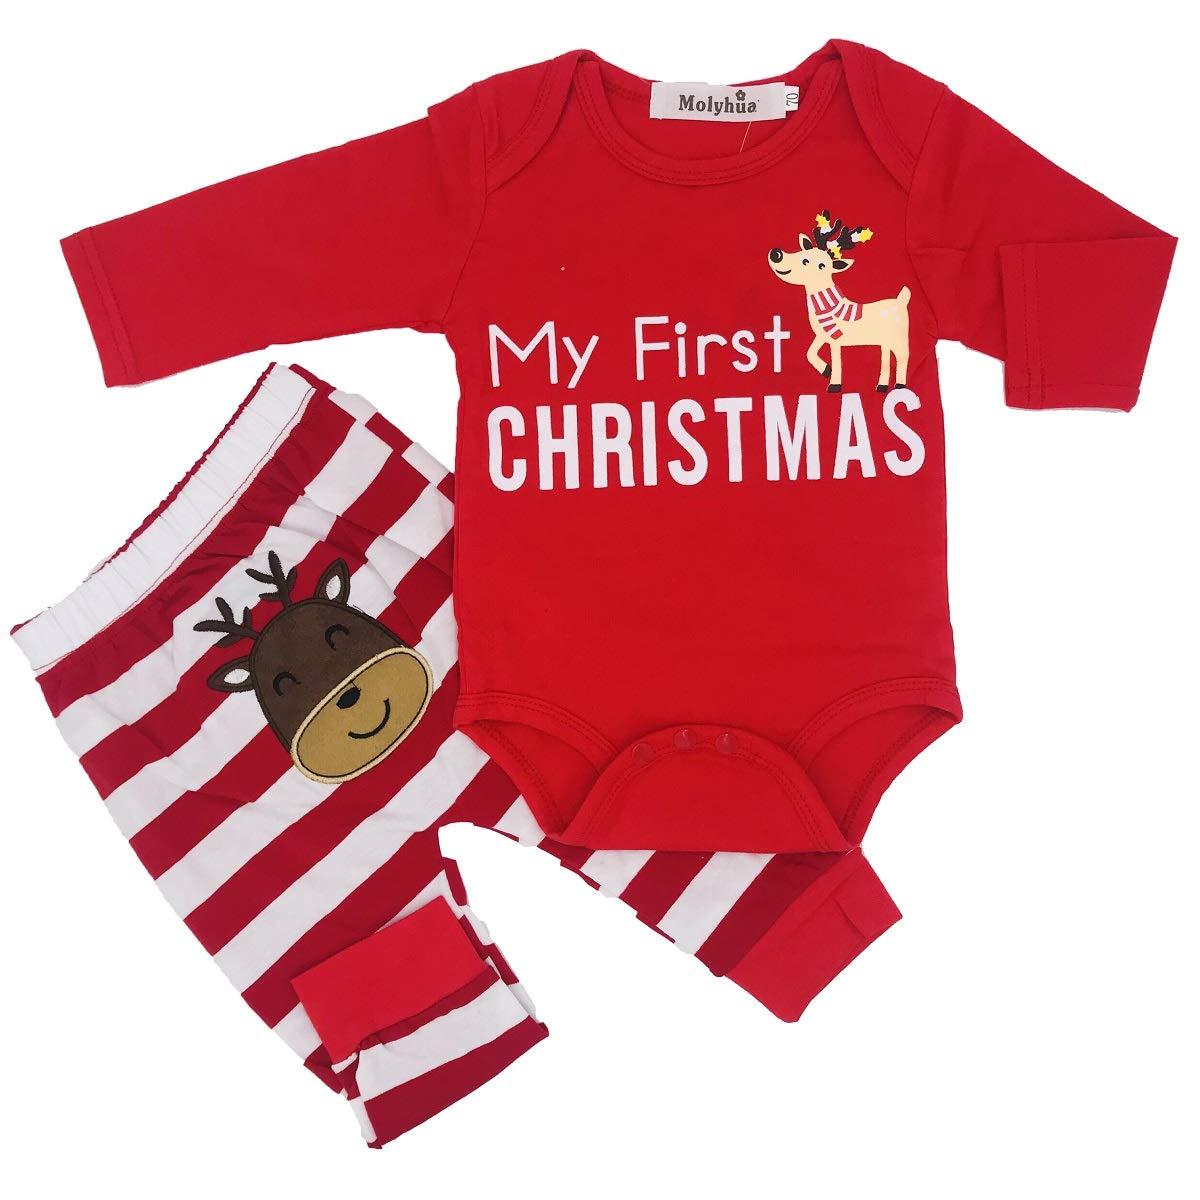 913639959e9 Amazon.com  MOLYHUA Baby Christmas Pajamas